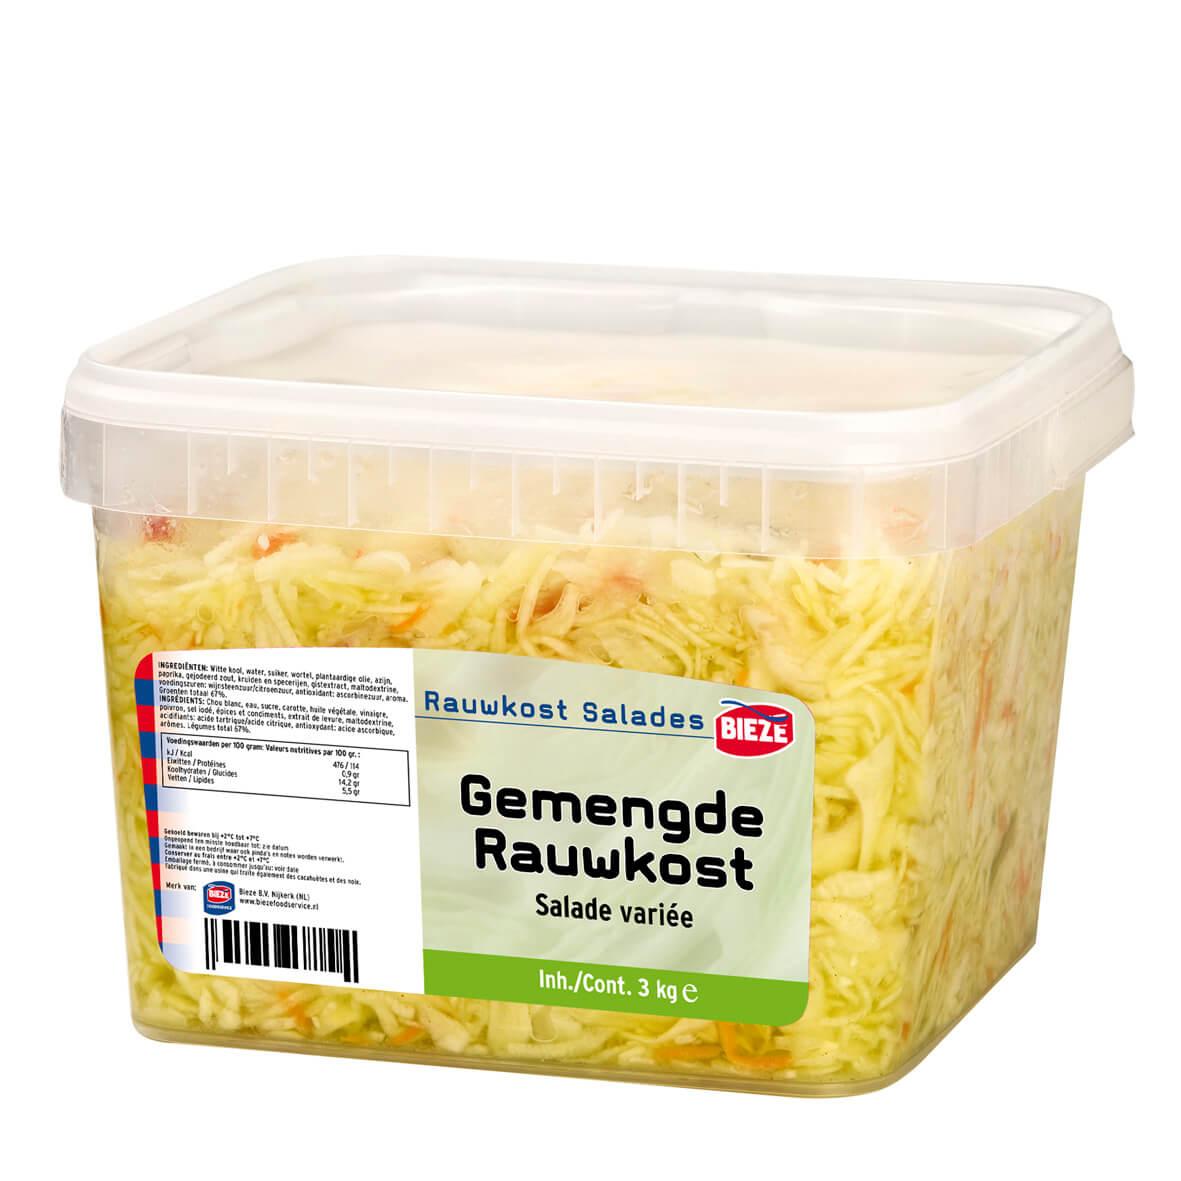 GEMENGDE RAUWKOST - emmer